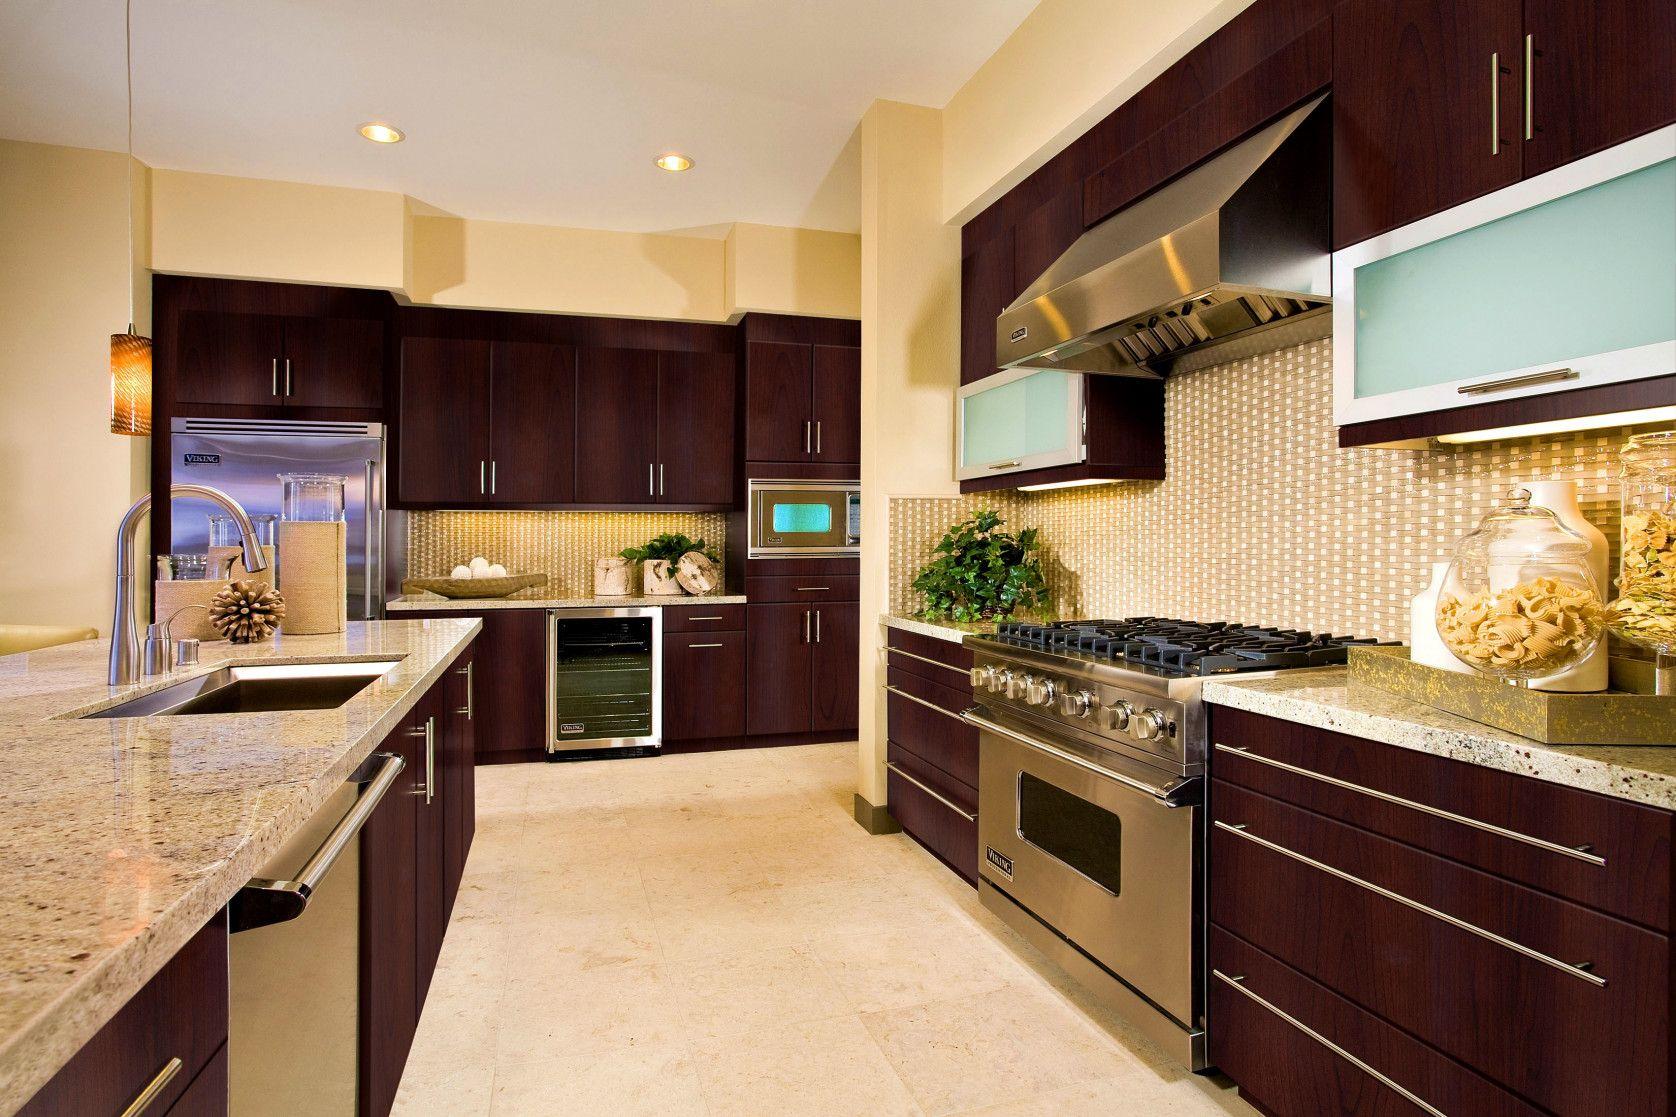 Pin by rahayu12 on interior analogi | Kitchen cabinets ...